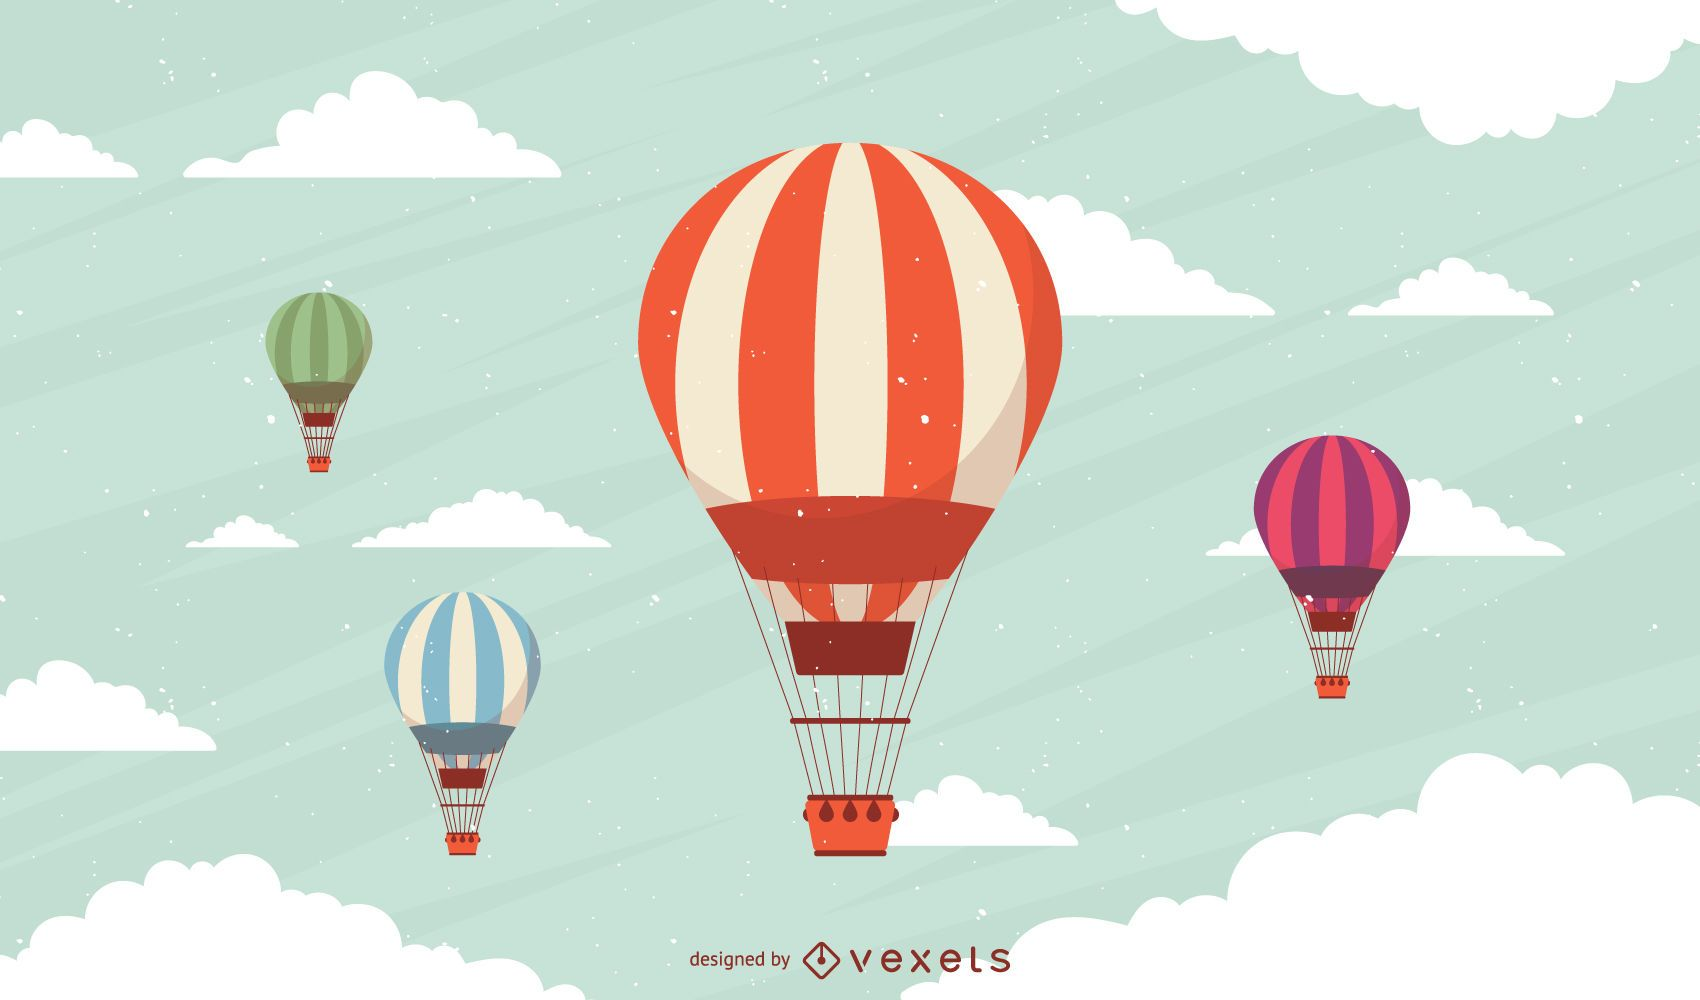 Conjunto de globos aerostáticos a rayas